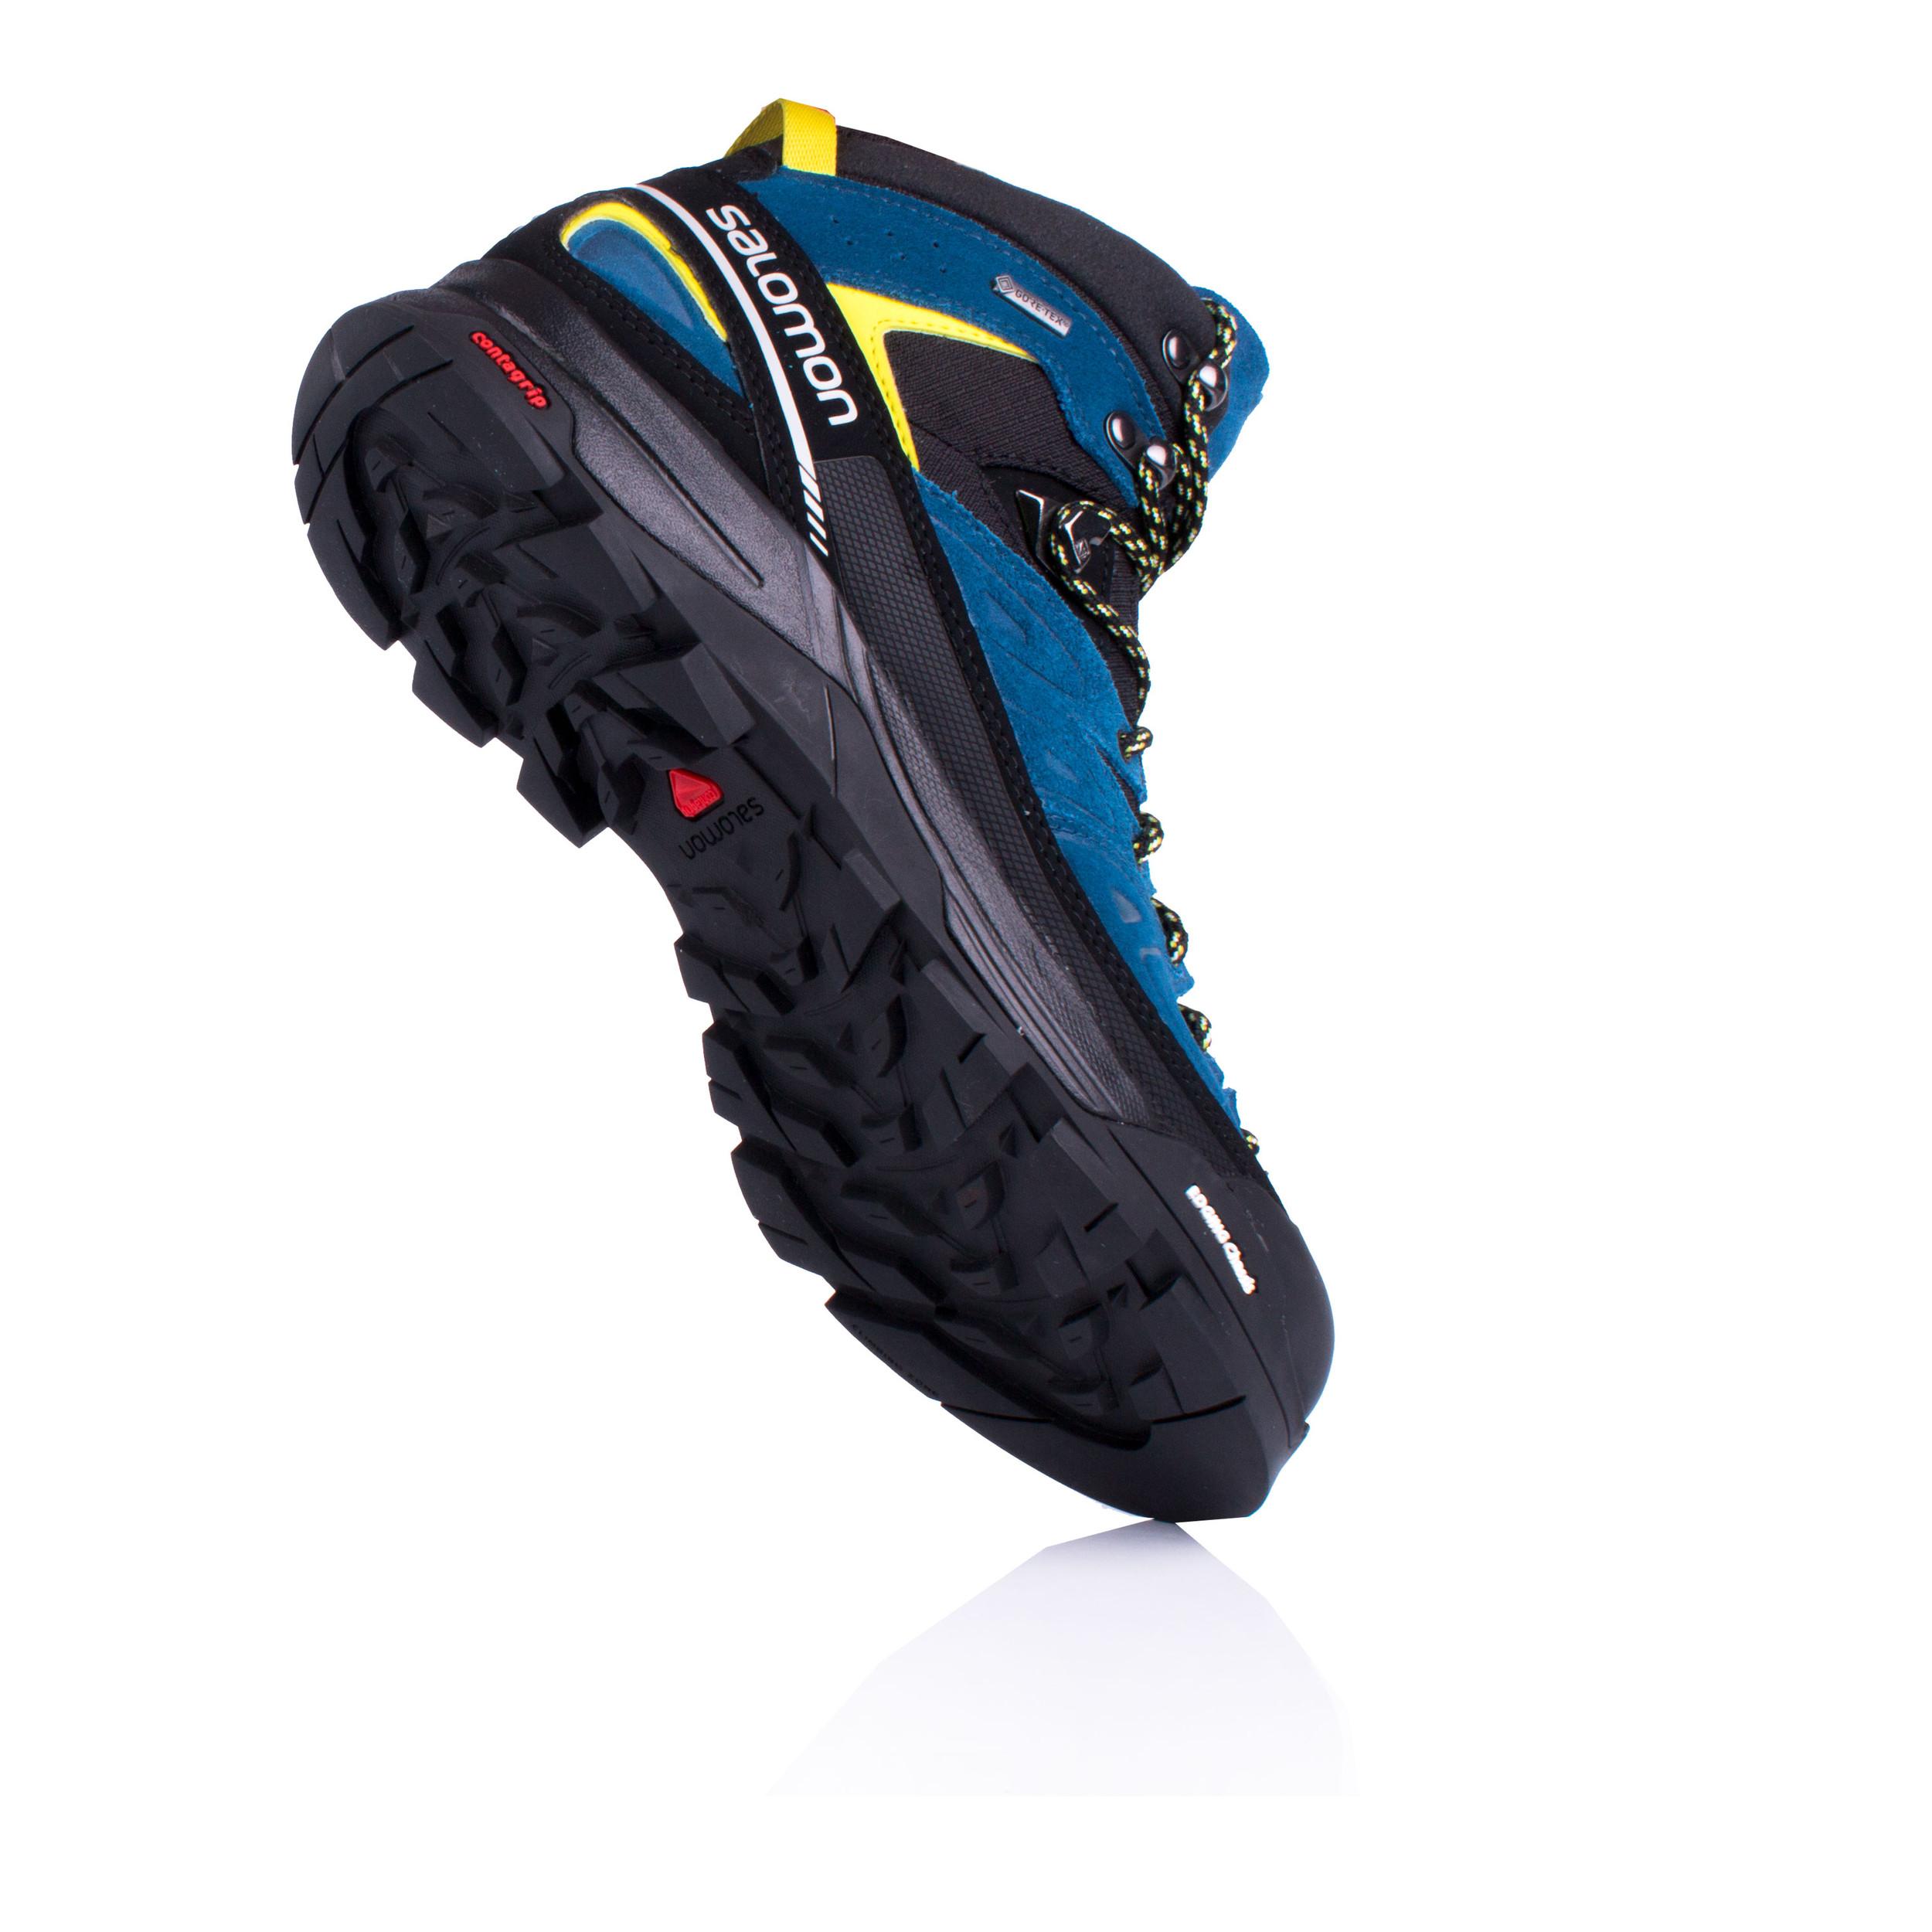 Salomon Uomo X Alp Mid Ltr Gore-Tex Scarpe da Trekking Scarponi Blu Sport 74b2b150b31